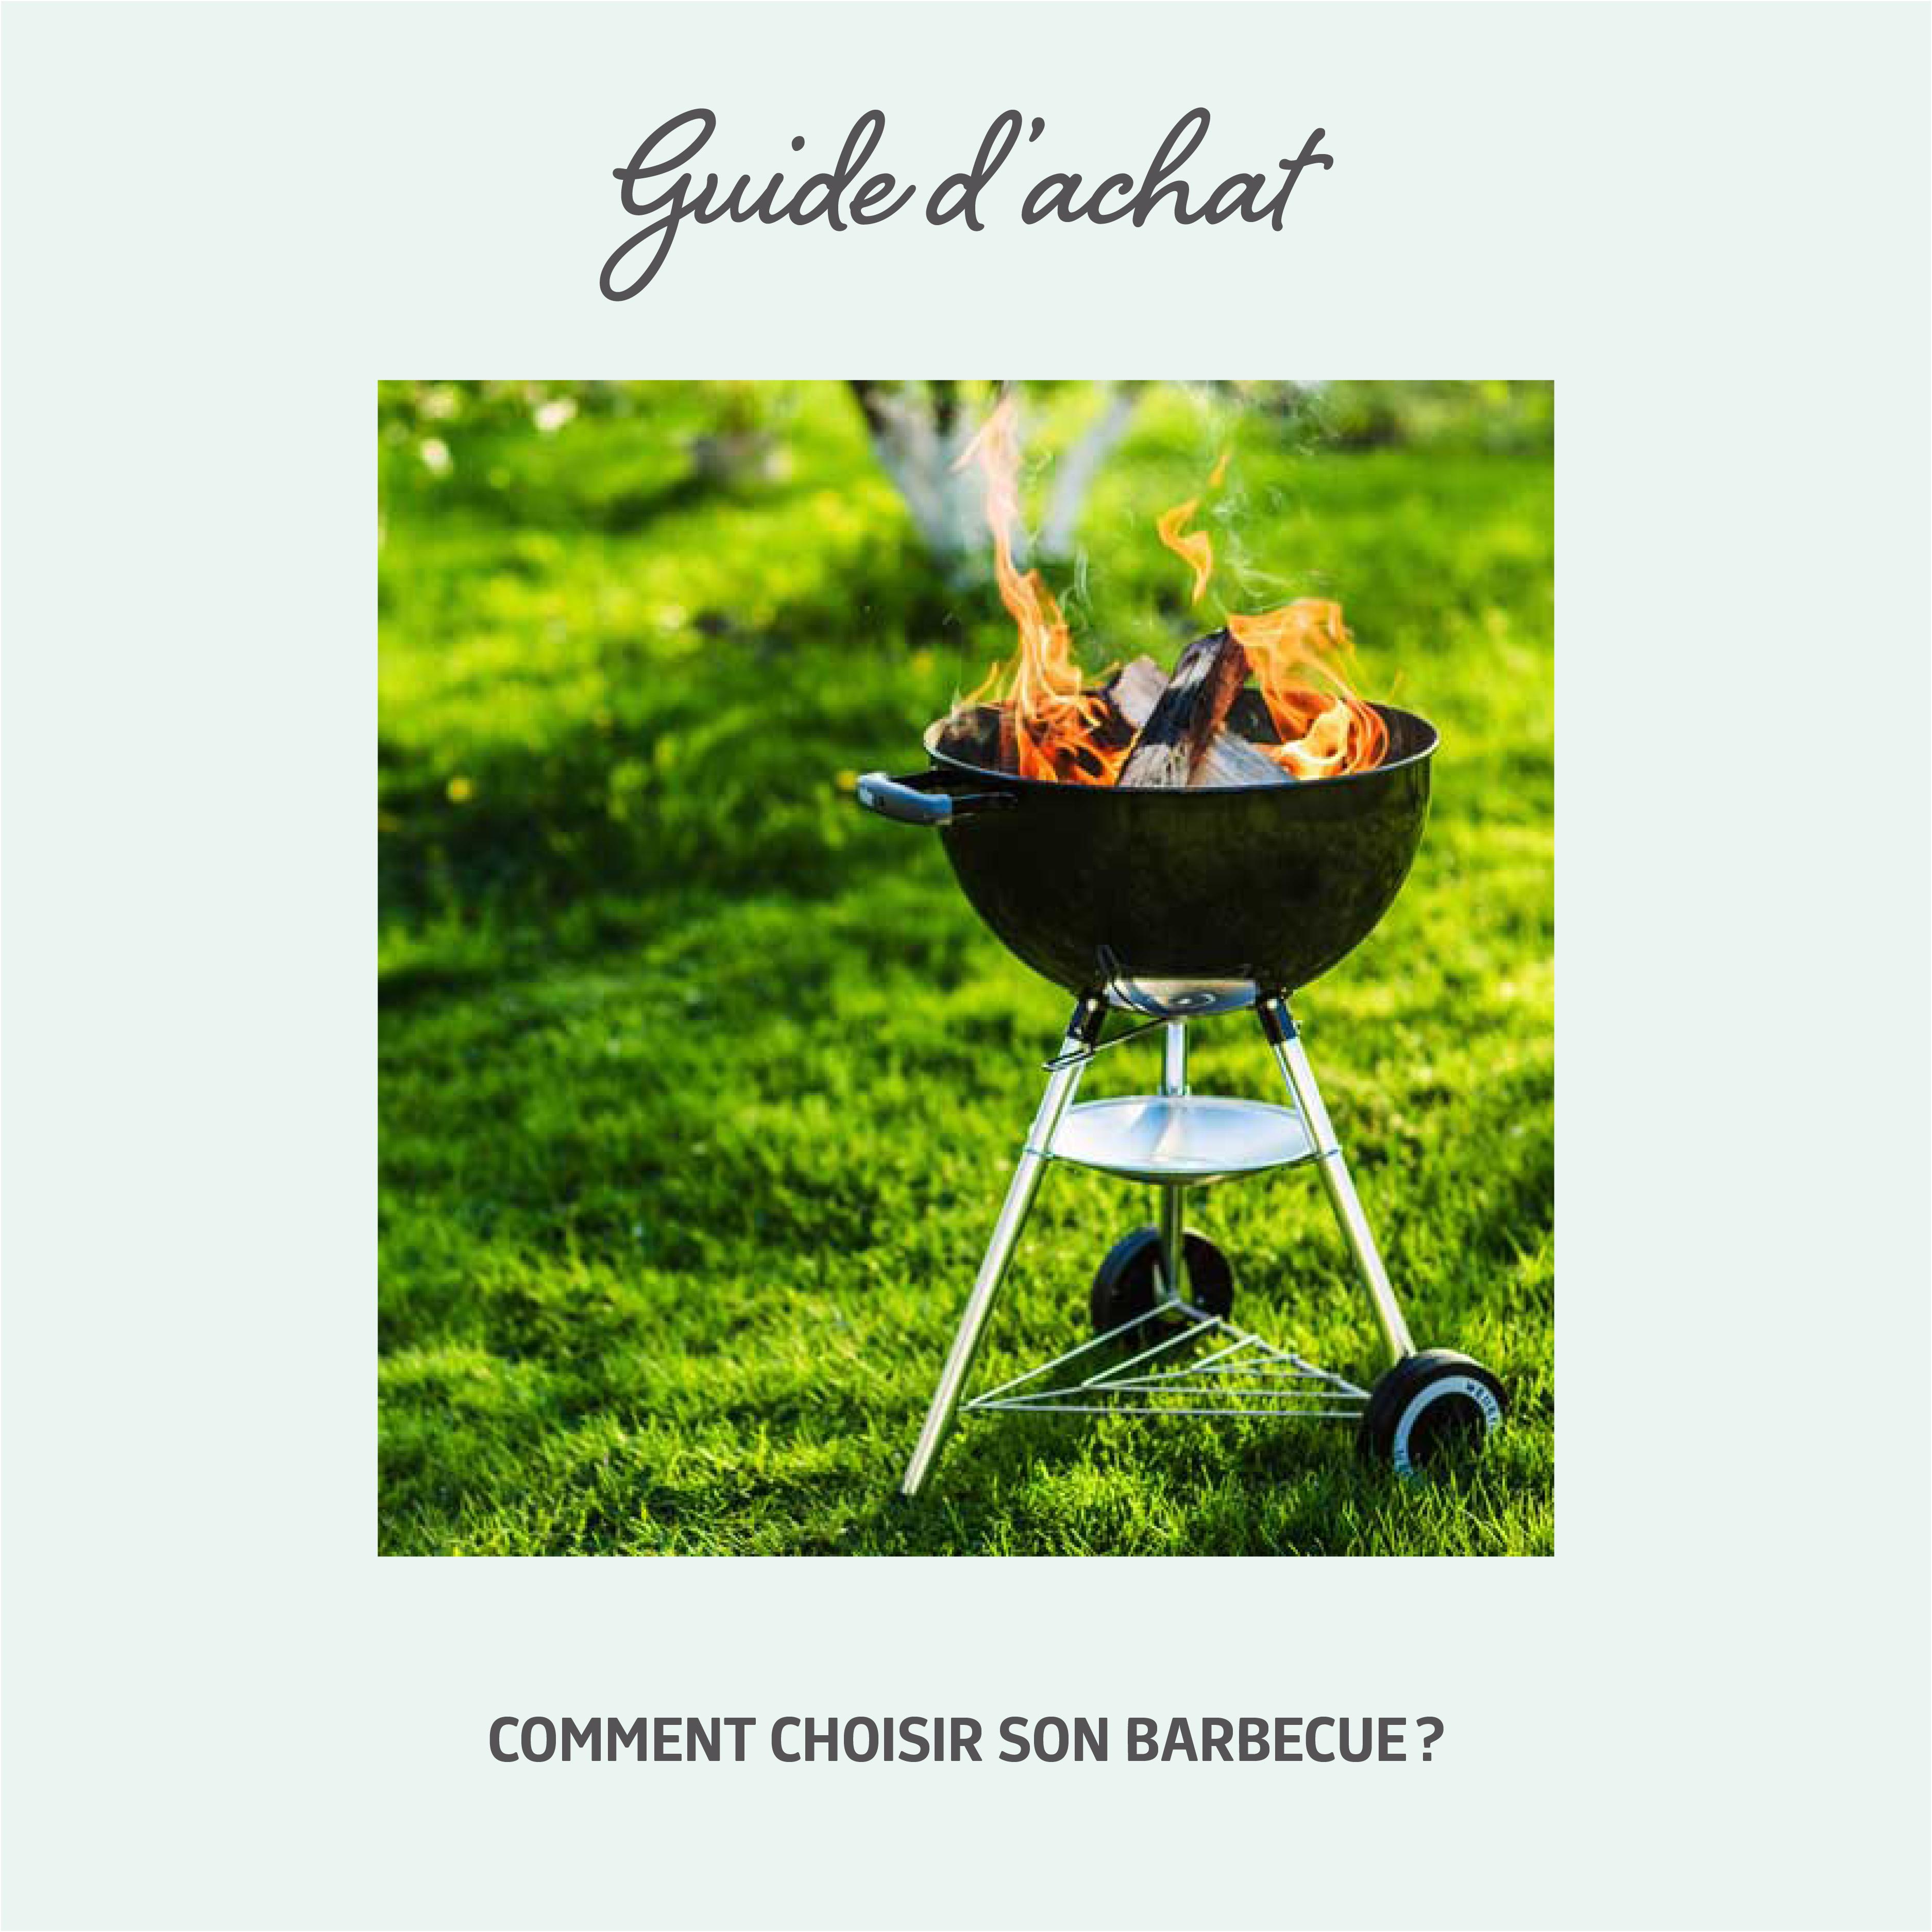 Barbecue Ou Plancha Que Choisir jardin #barbecue #bbq #printemps #grillades | barbecue